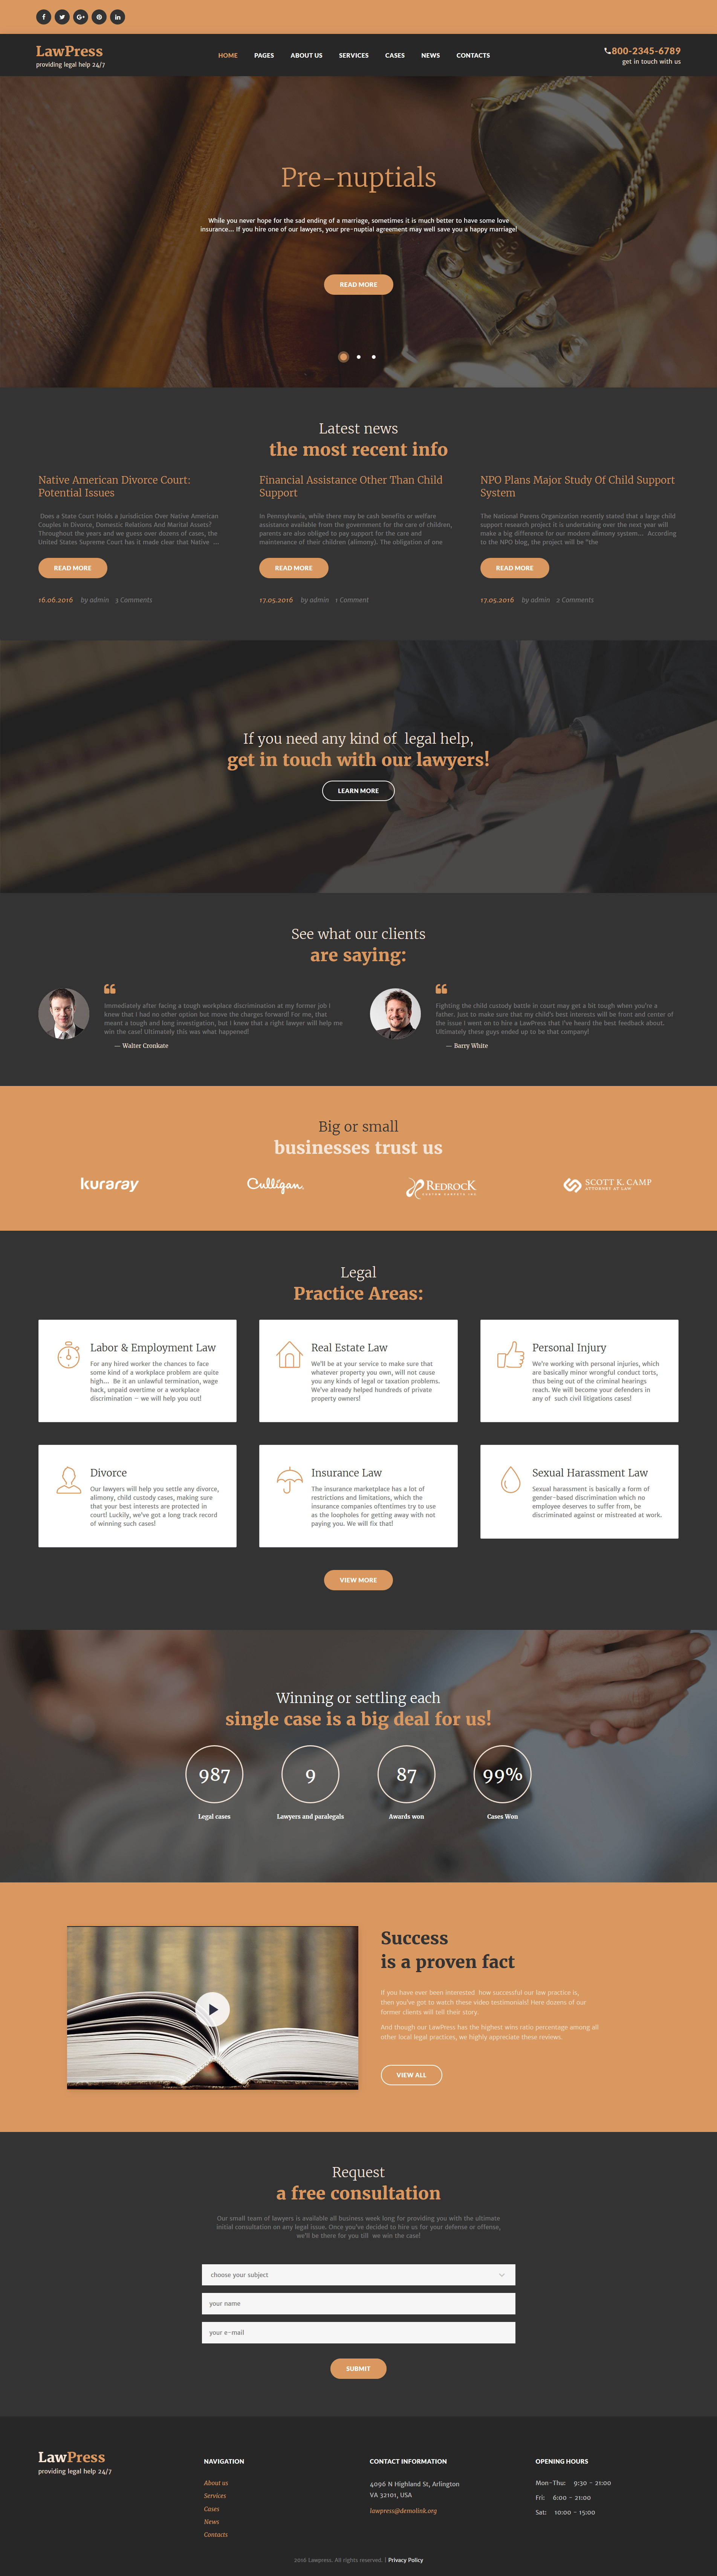 LawPress - Law Firm Responsive WordPress Theme - screenshot